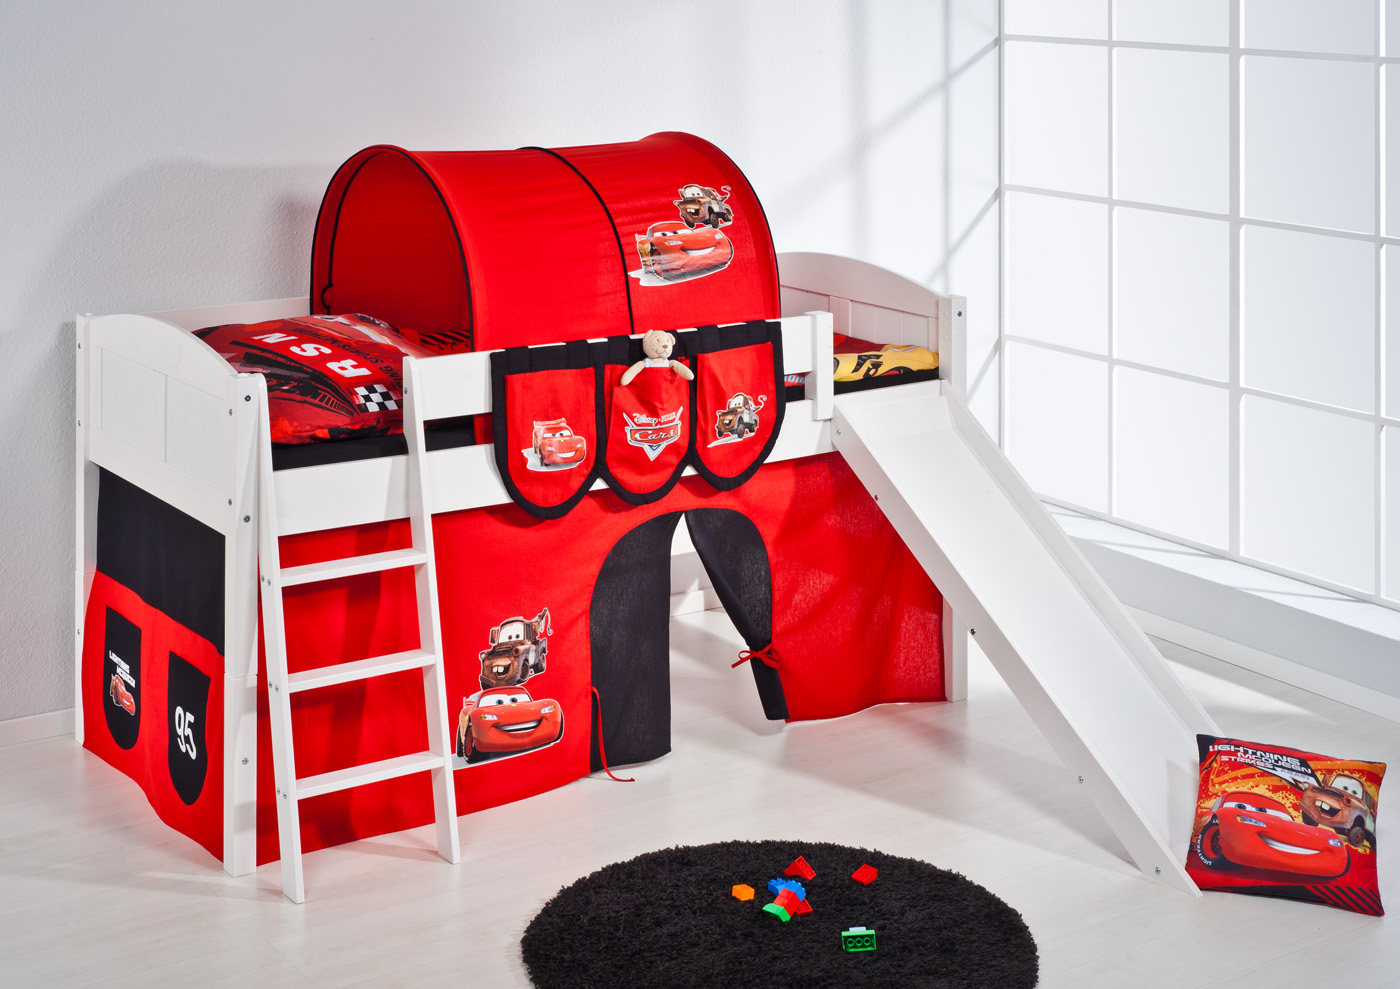 spielbett hochbett kinderbett kinder bett mit rutsche. Black Bedroom Furniture Sets. Home Design Ideas